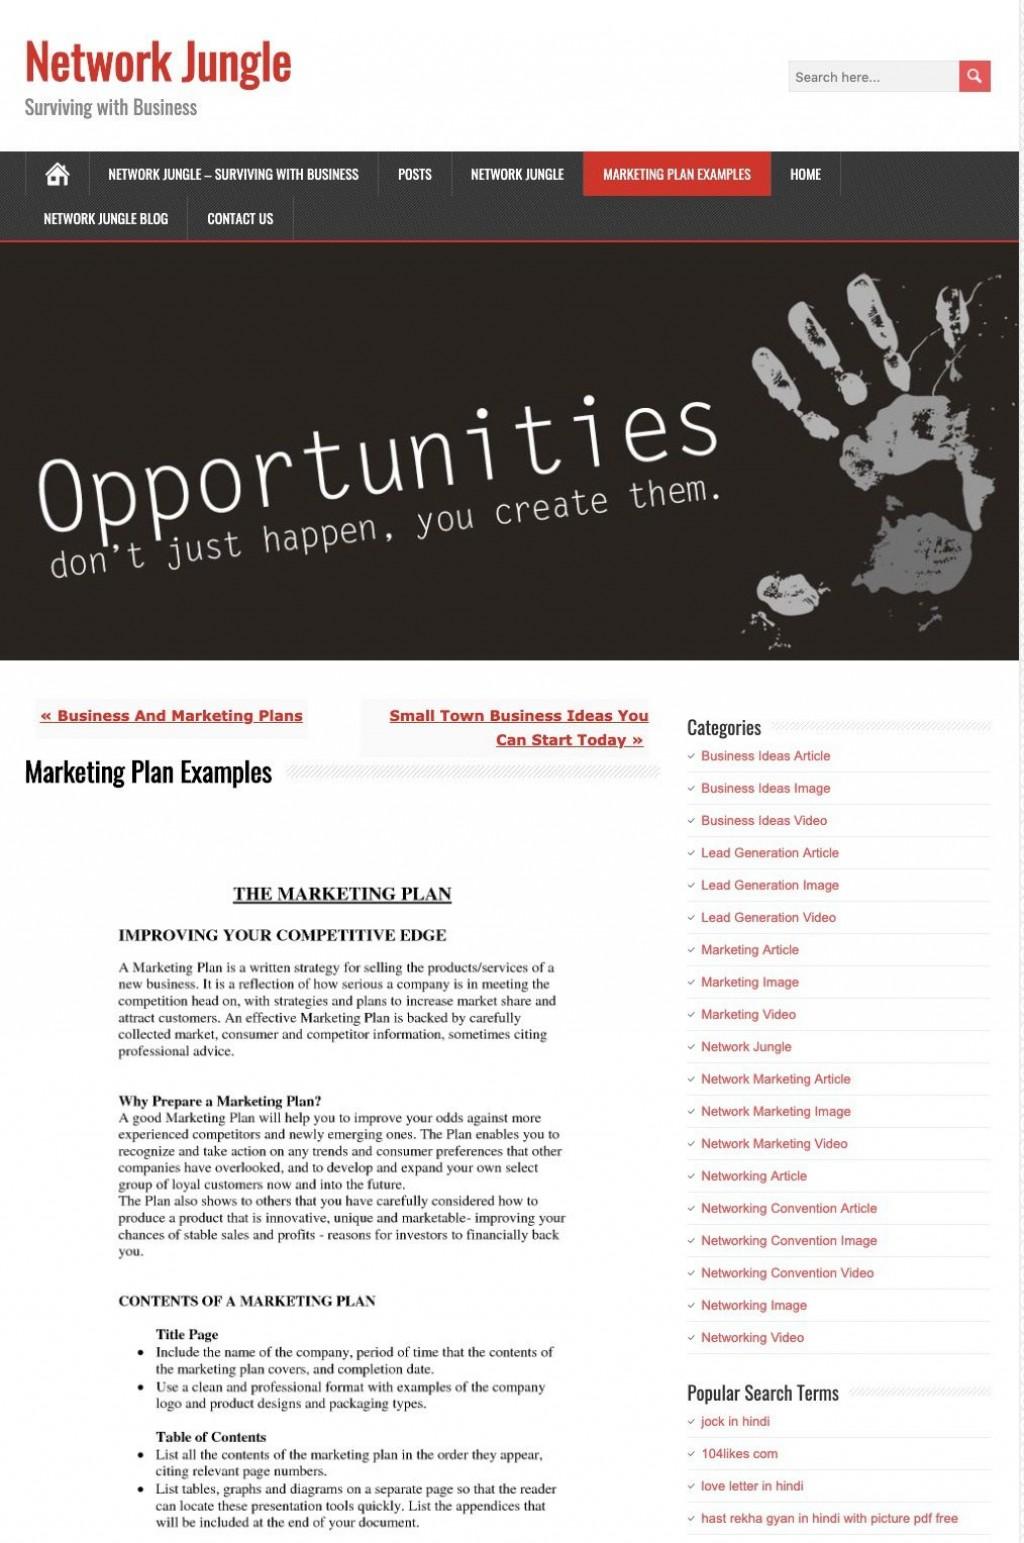 009 Sensational Digital Marketing Plan Example Pdf Image  Free Template Busines SampleLarge